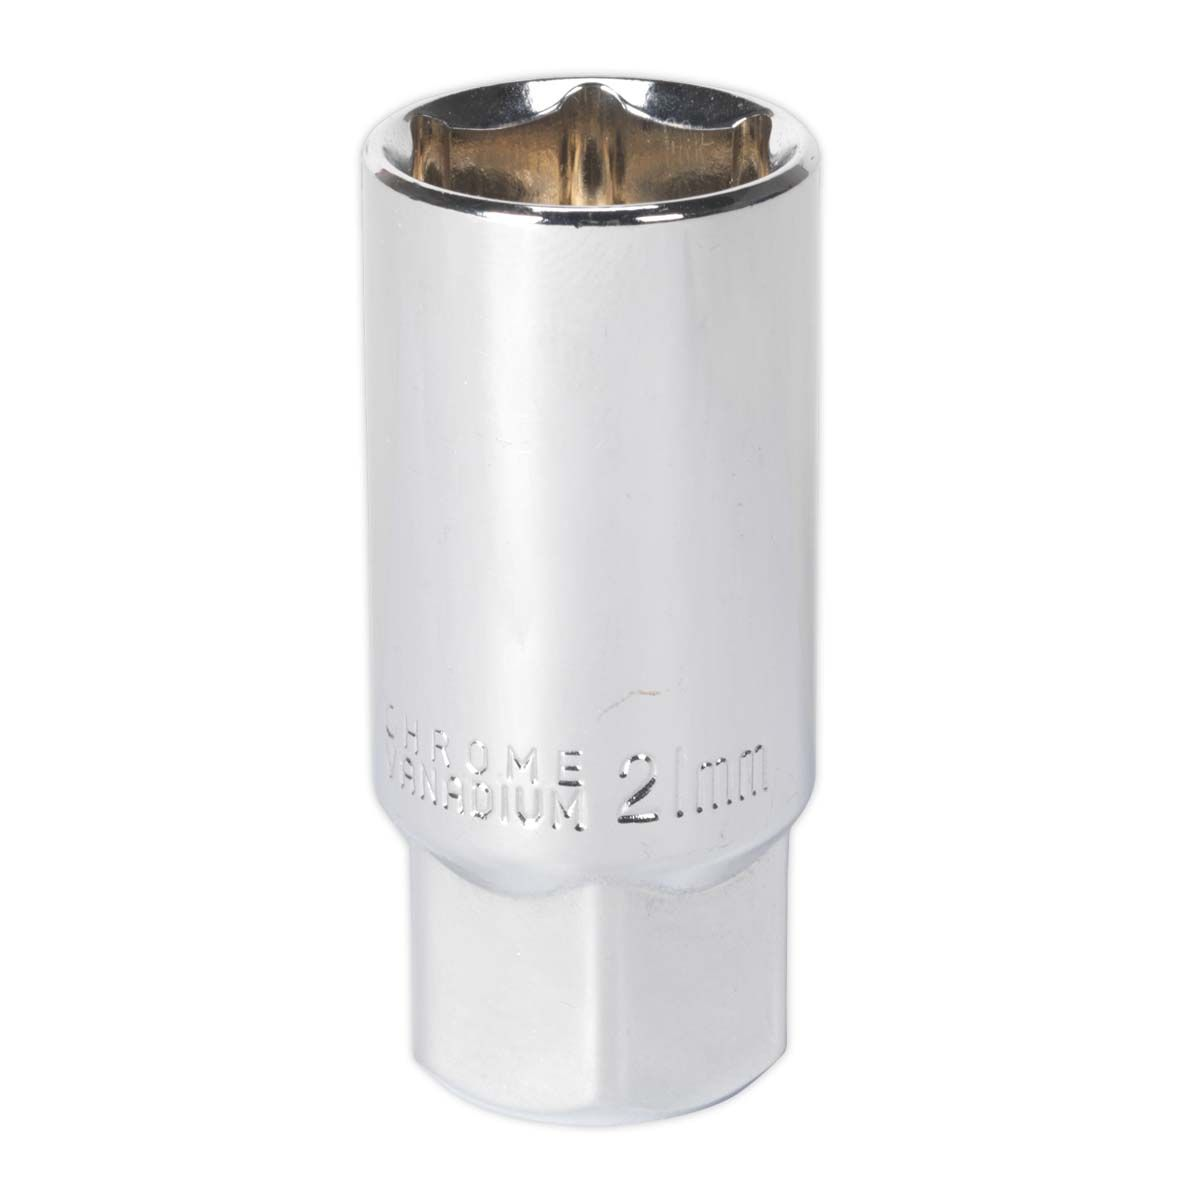 "Sealey Spark Plug Socket 21mm 1/2""Sq Drive Magnetic"